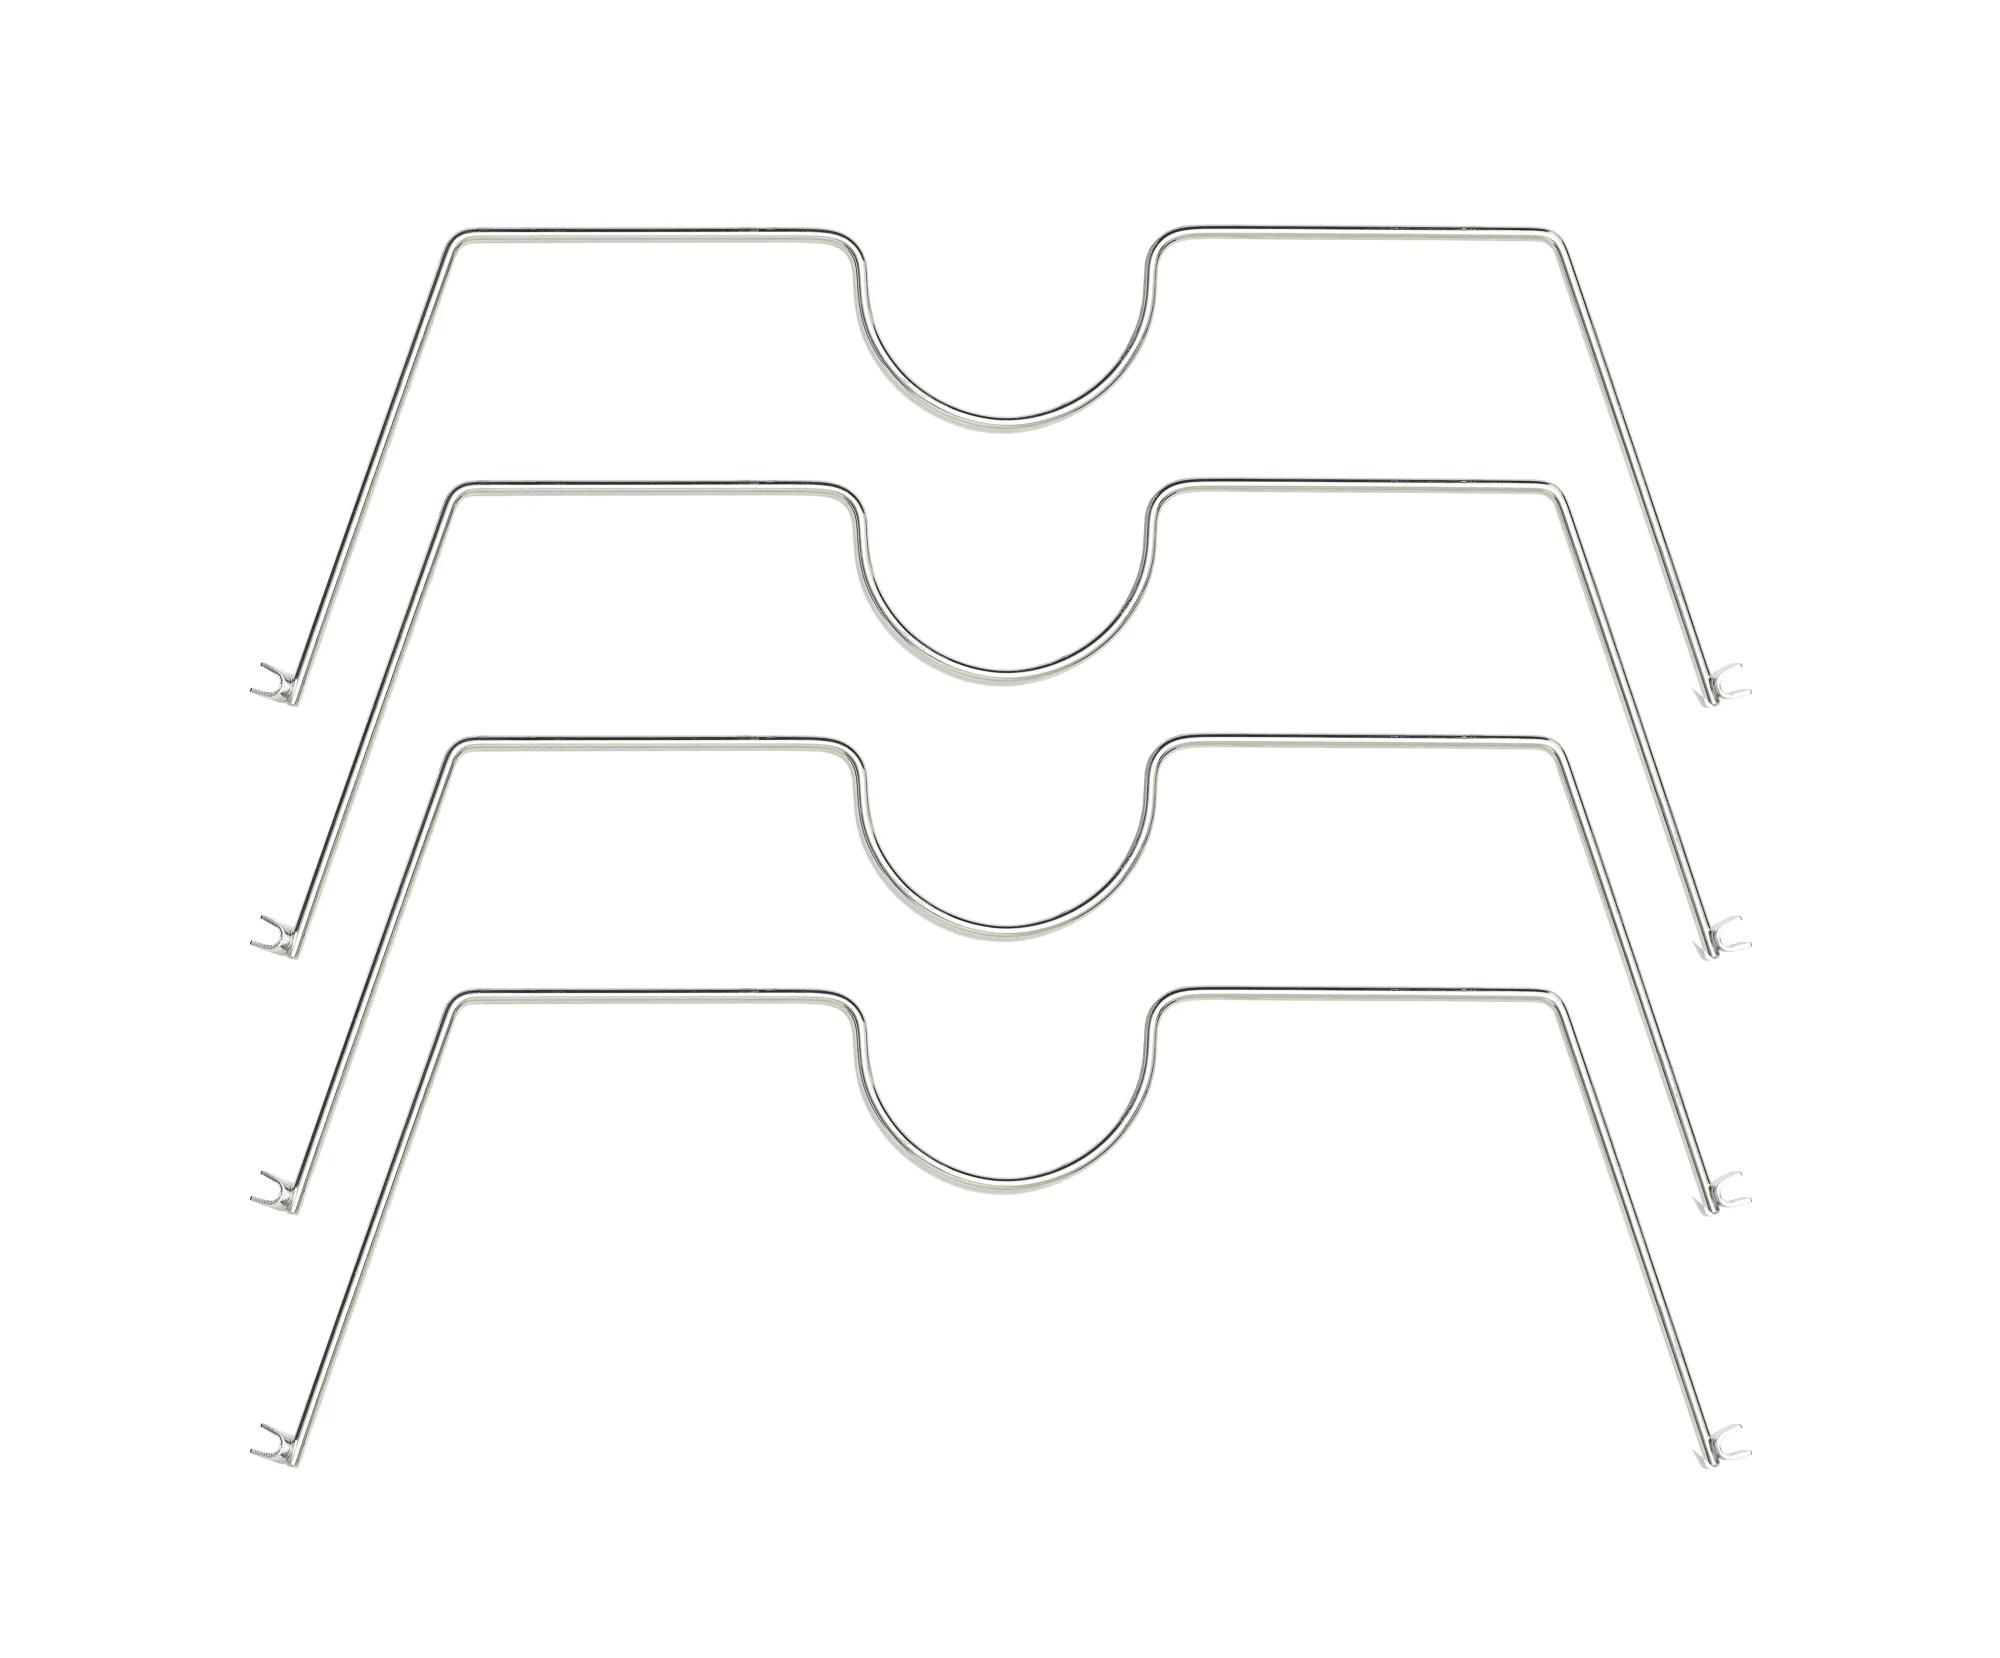 Hss Shelf Divider Fits On 18 Deep Wire Shelf Chrome